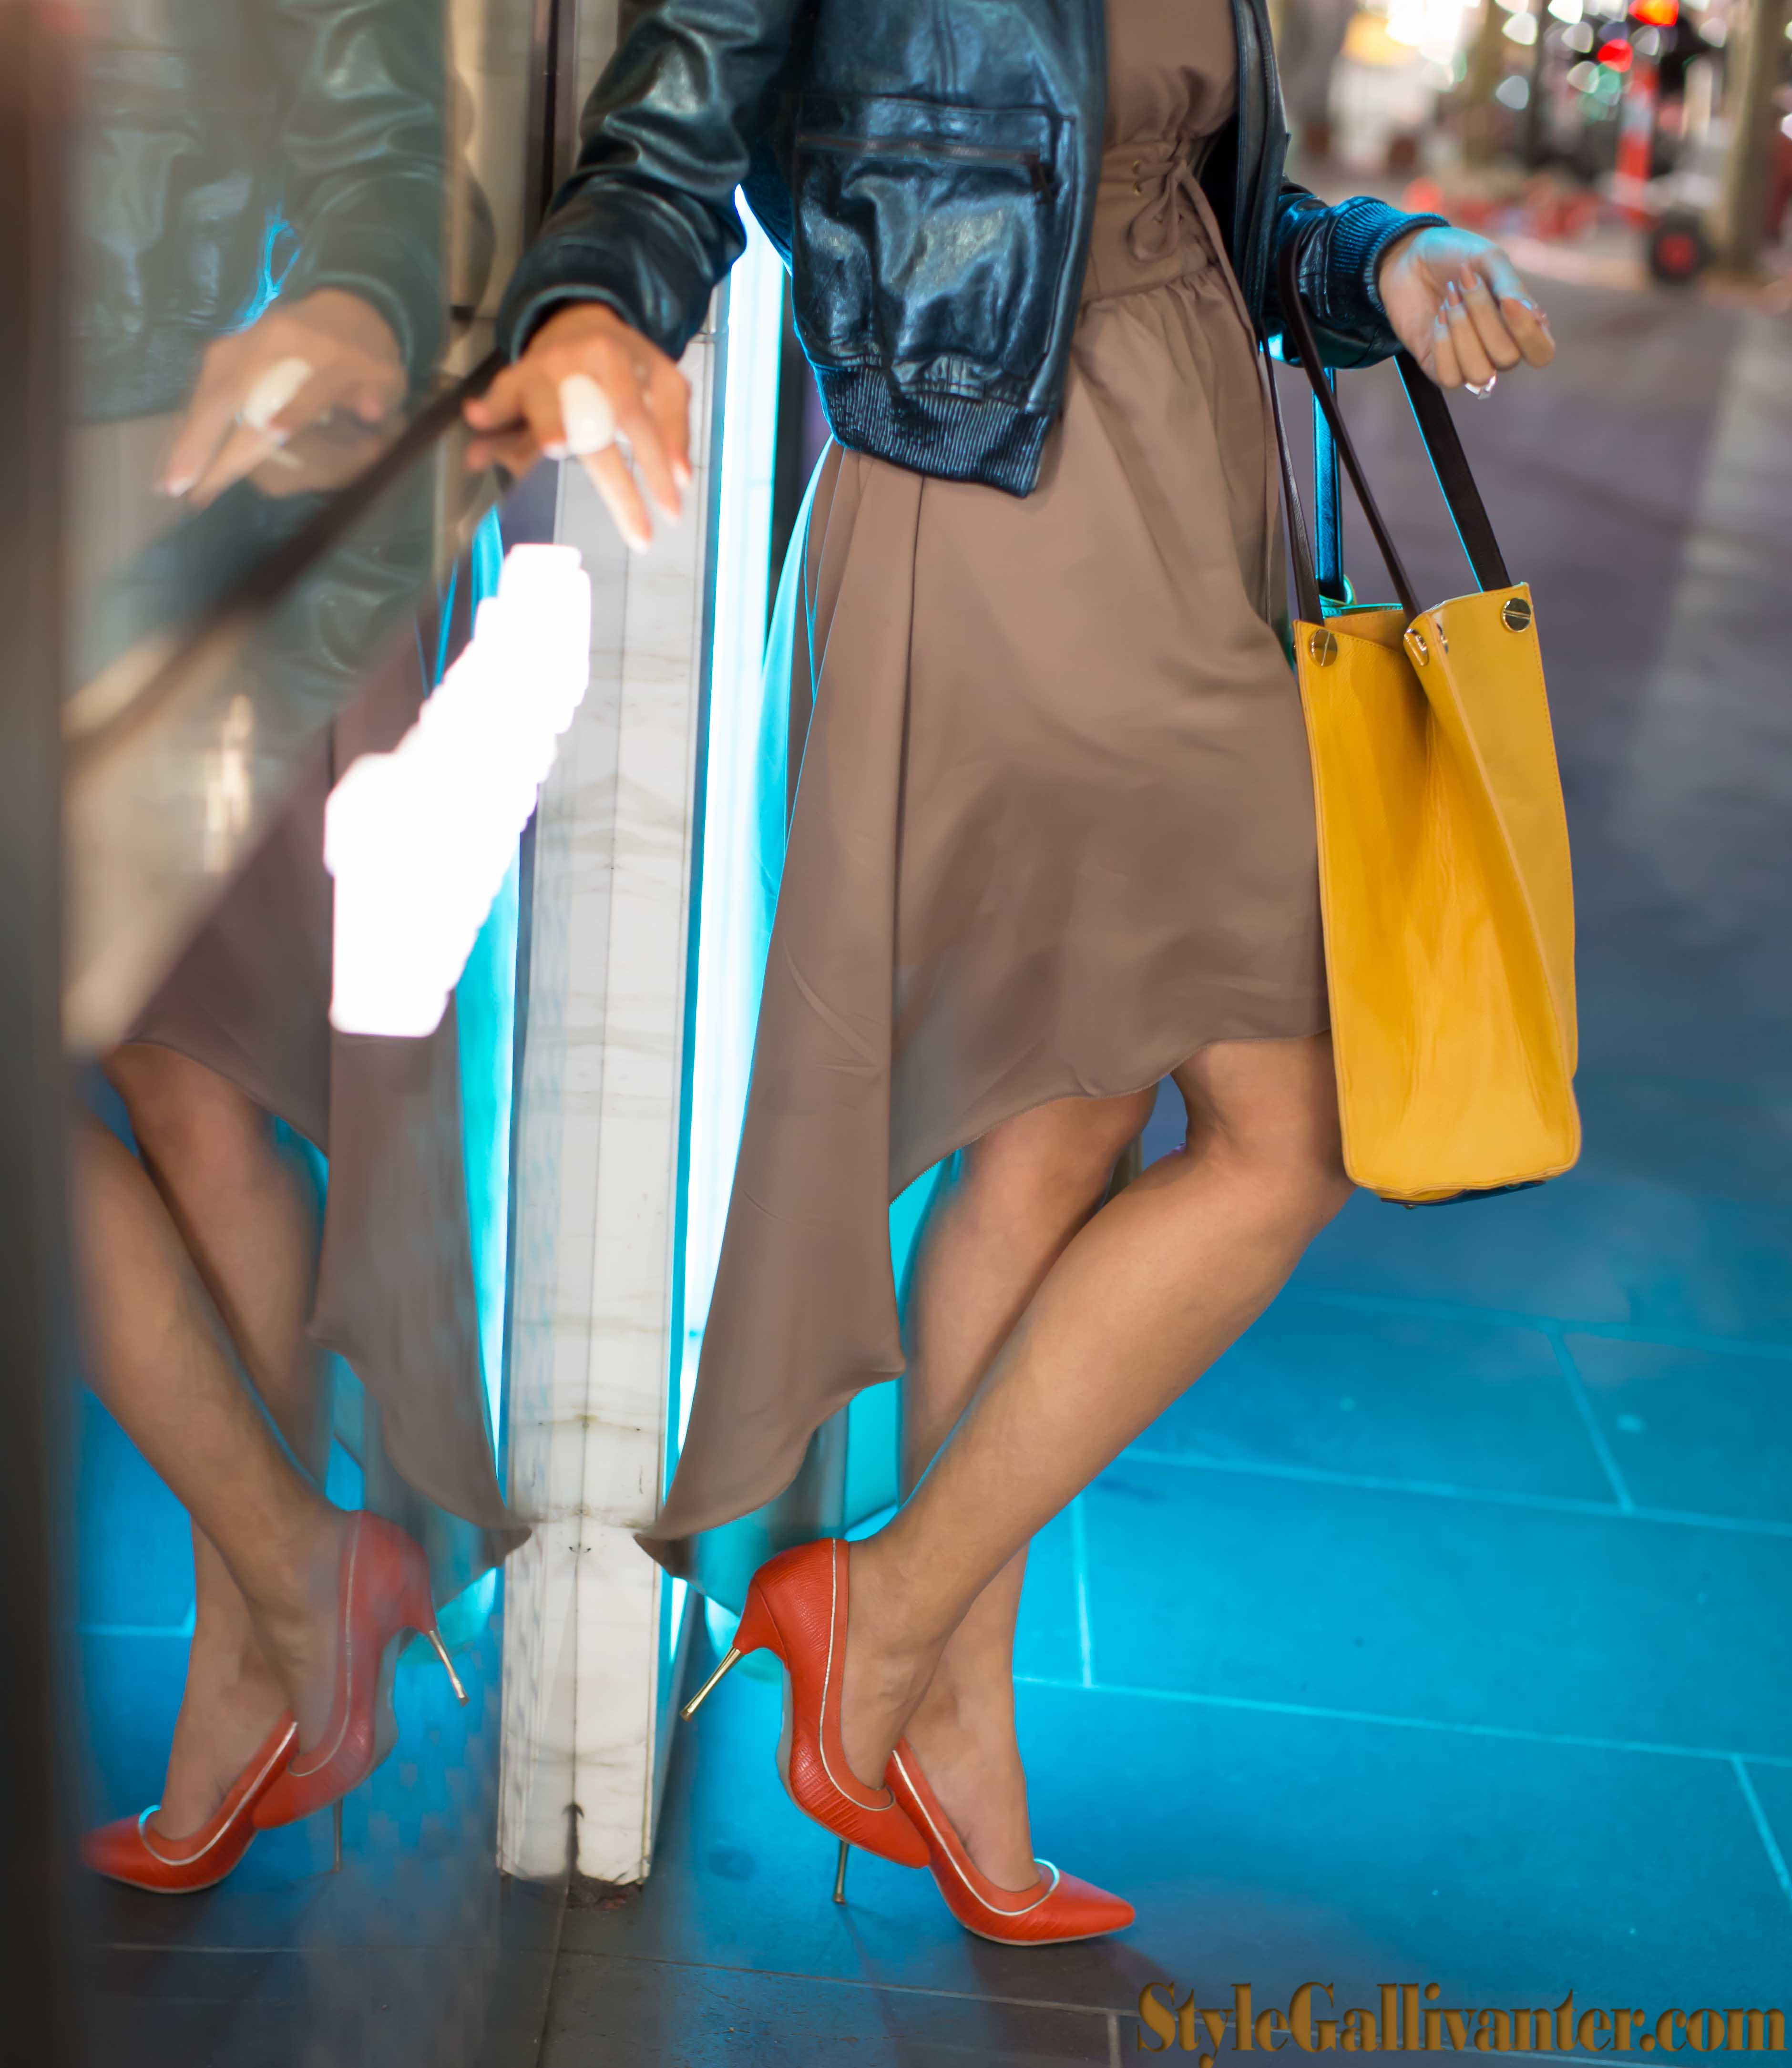 trade-secret-fashion-blogger_trade-secret-blogger_trade-secret-clothes_trade-secret-melbourne_trade-secret-spencer-outlet_trade-secret-brands_melbourne's-best-fashion-blogger_melbourne'sbest-fashion-bloggers